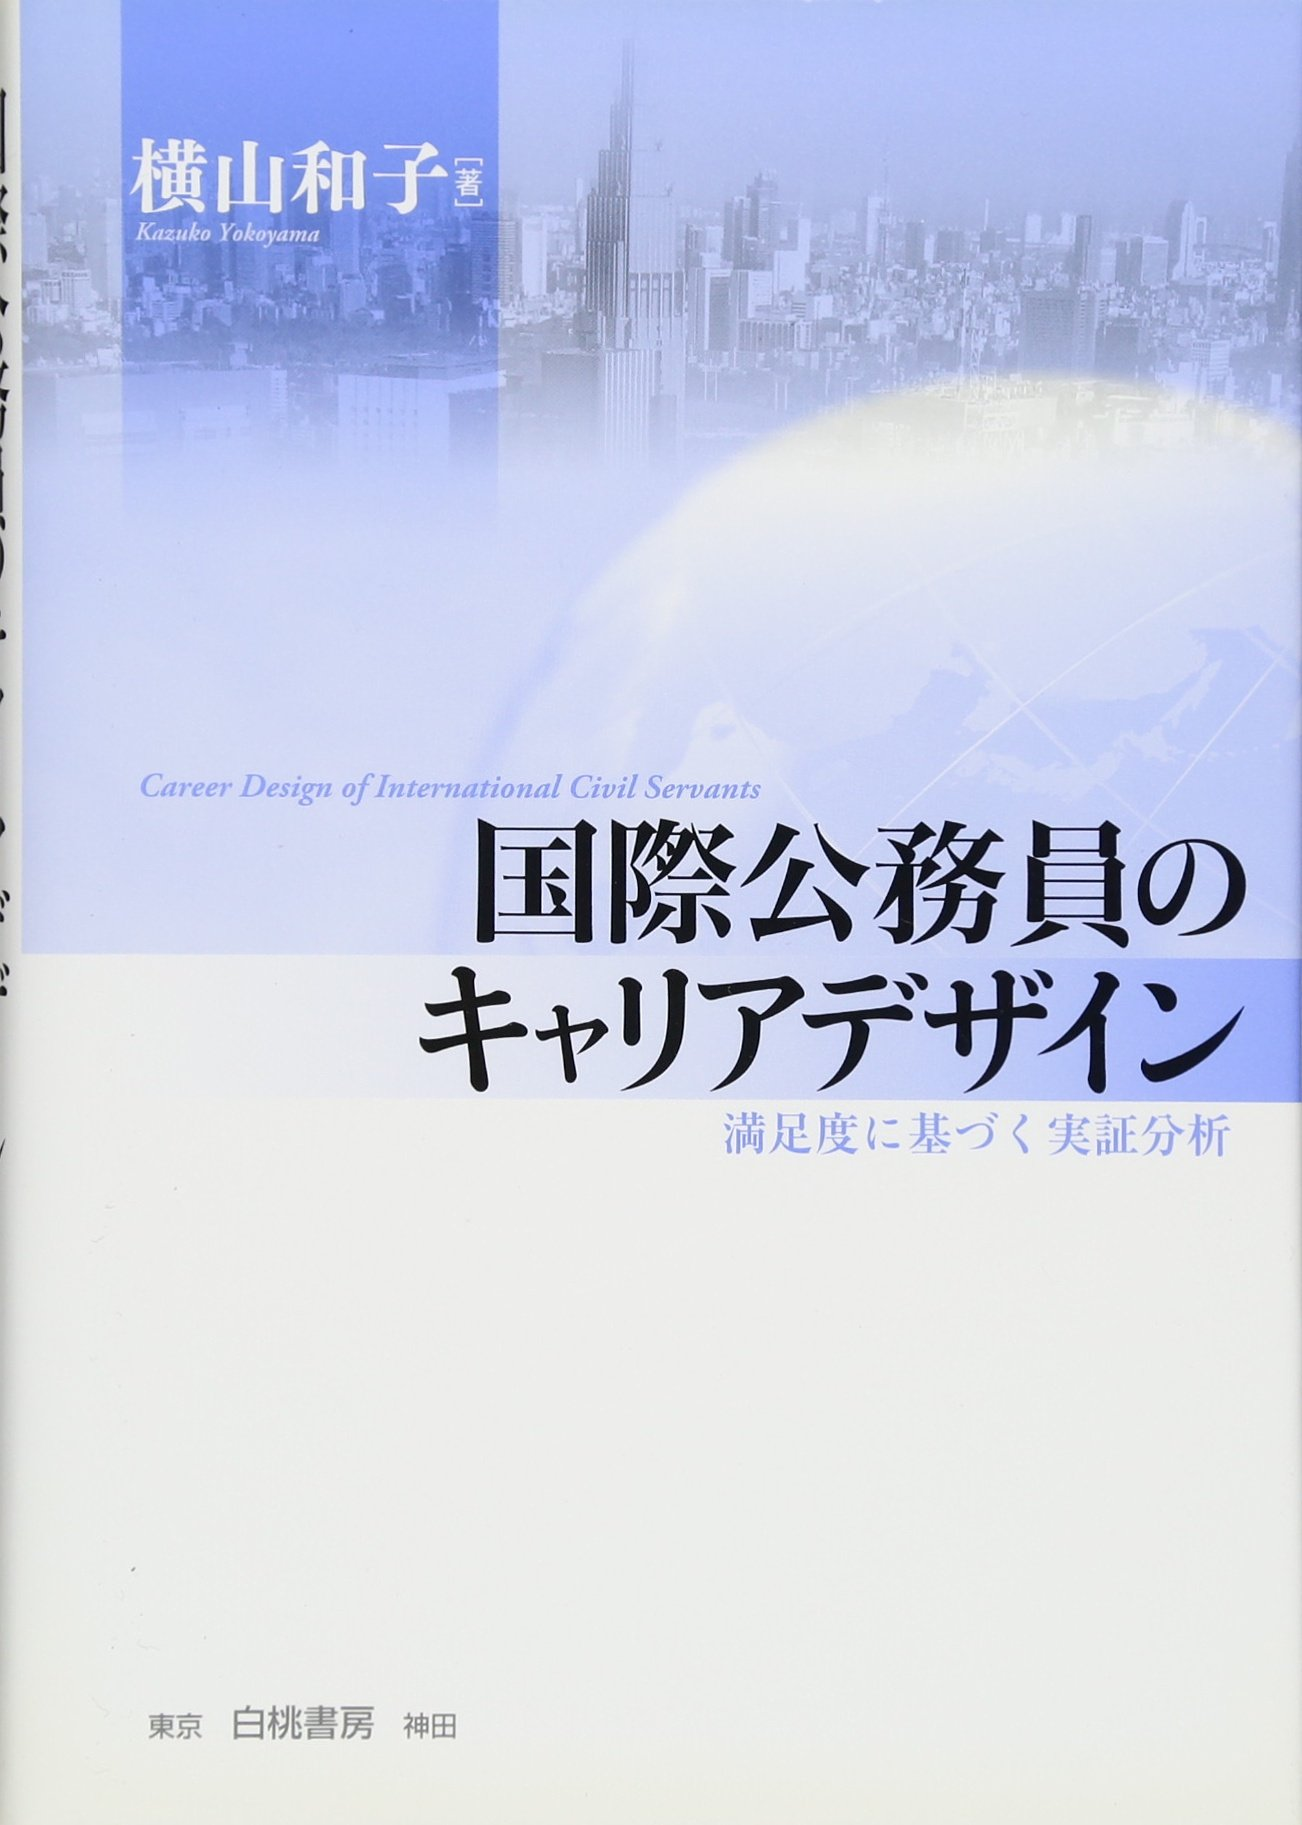 Download Kokusai kōmuin no kyaria dezain = Career Design of International Civil Servants : Manzokudo ni motozuku jisshō bunseki pdf epub